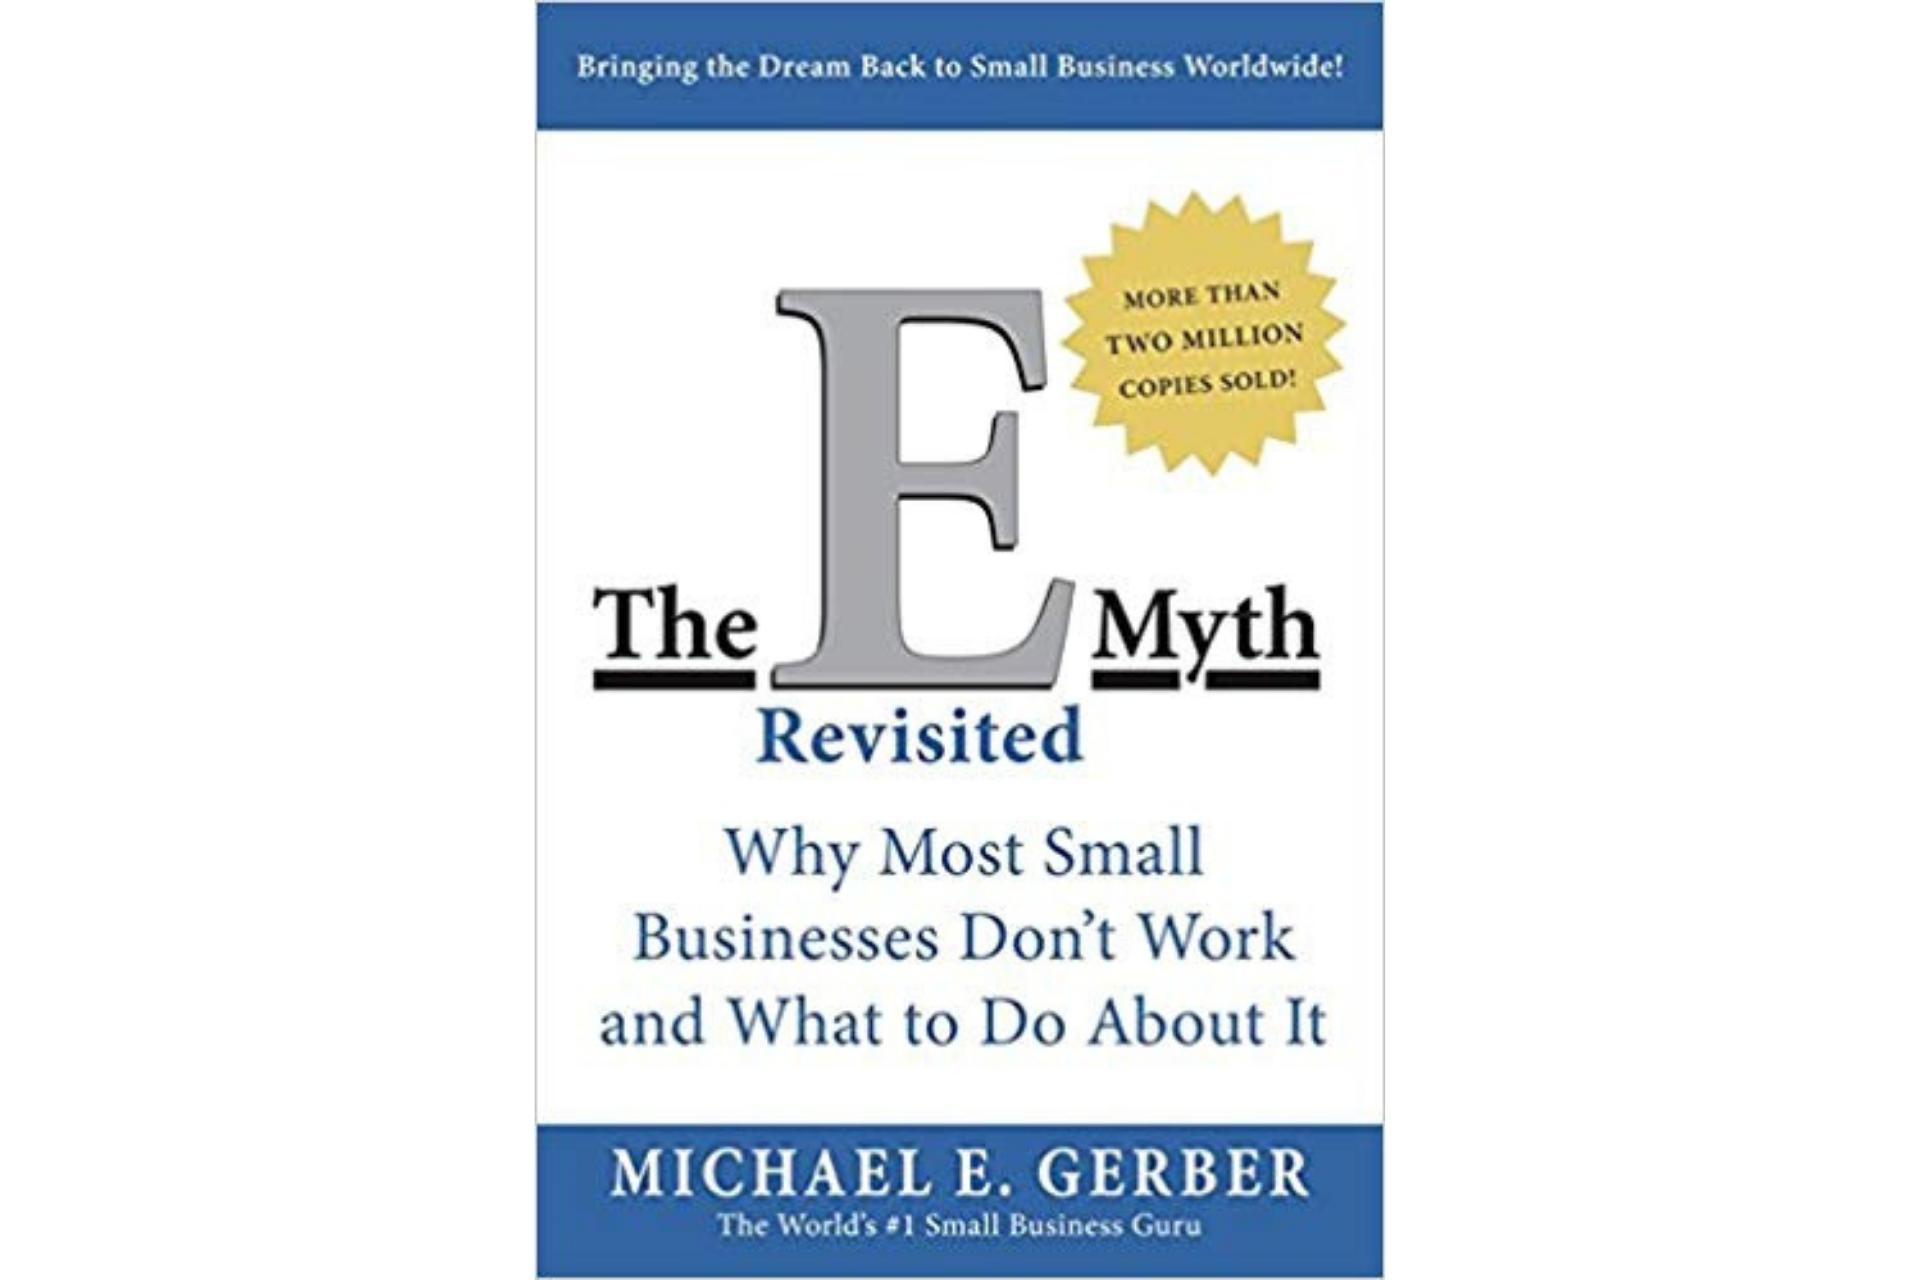 The E-Myth by Michael Gerber